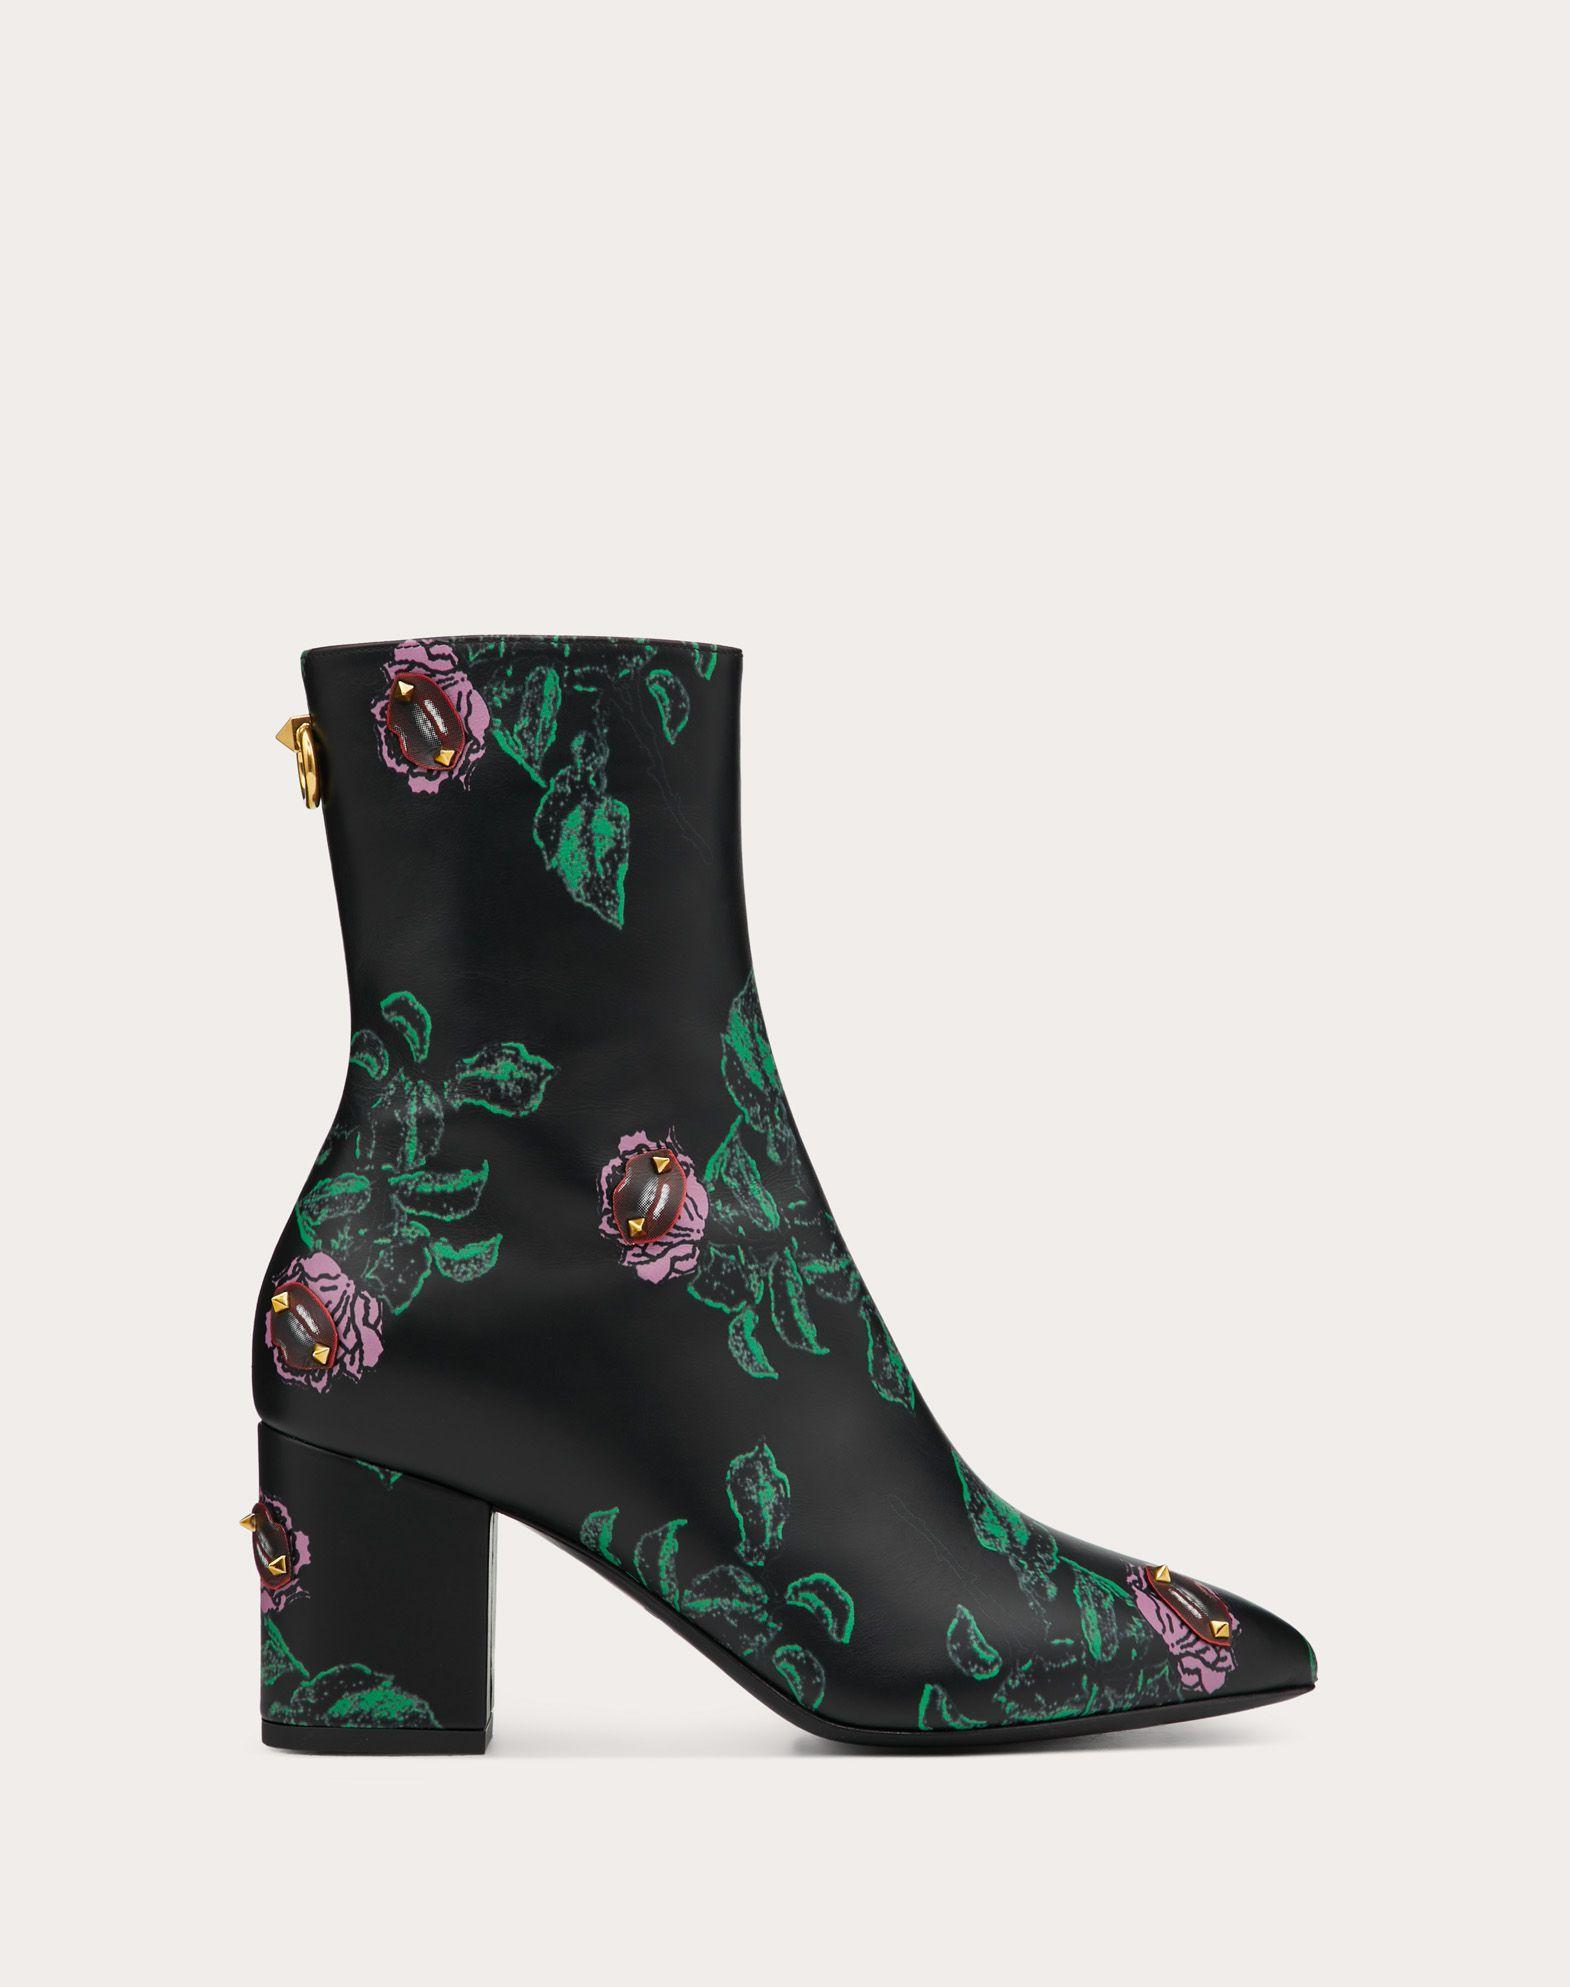 Valentino Garavani Undercover Ankle Boot 70 mm